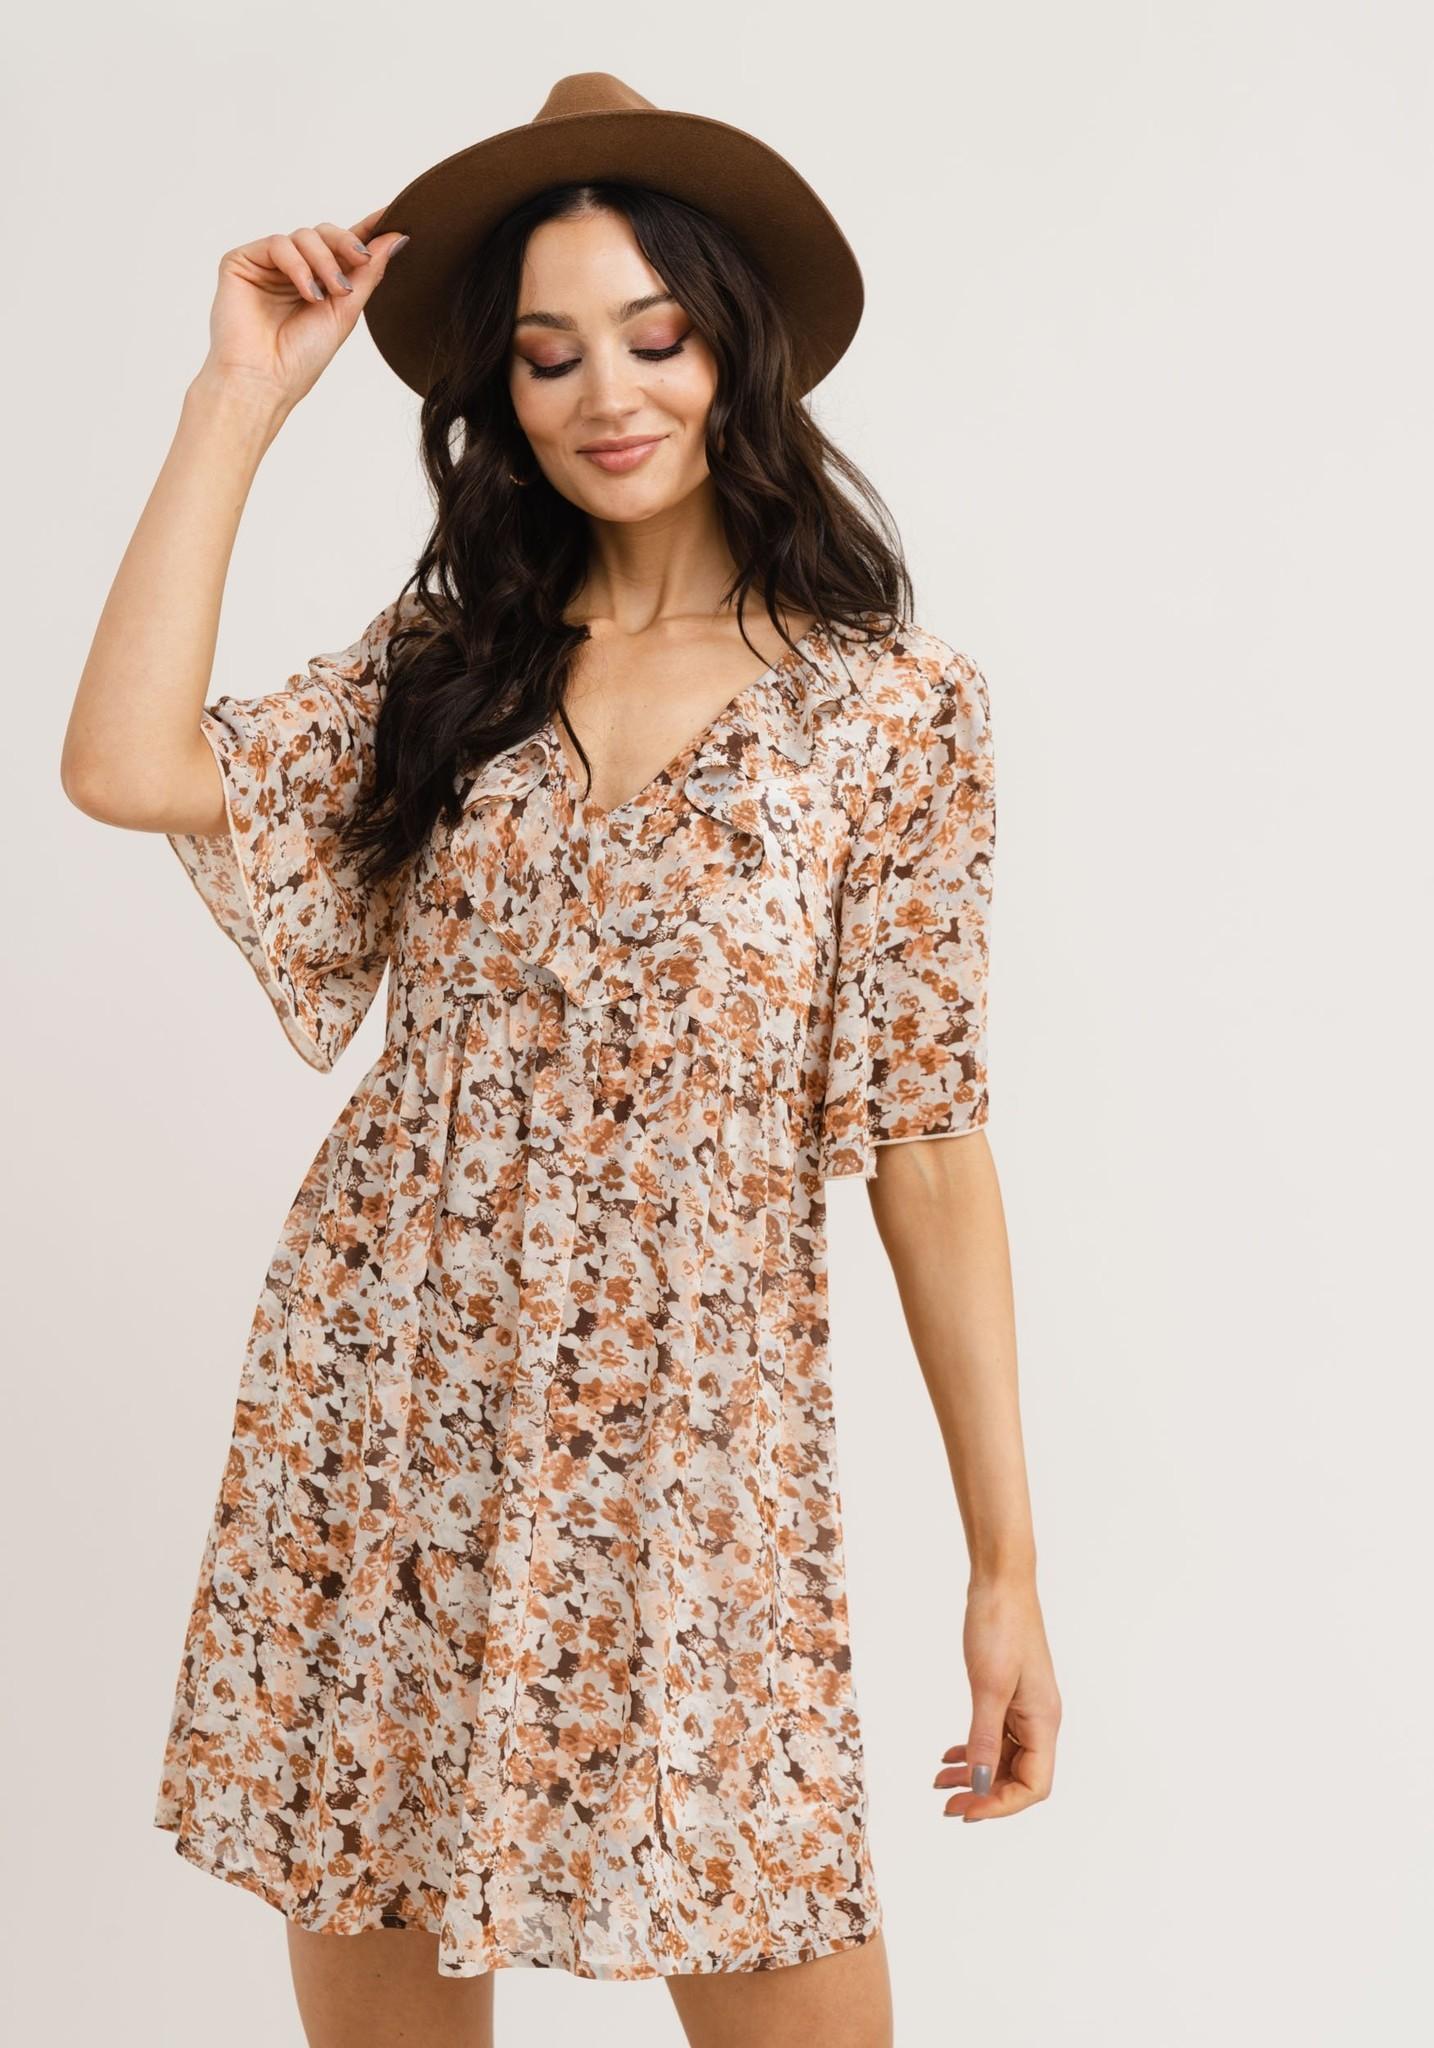 RC Mindy Dress Brown Flower